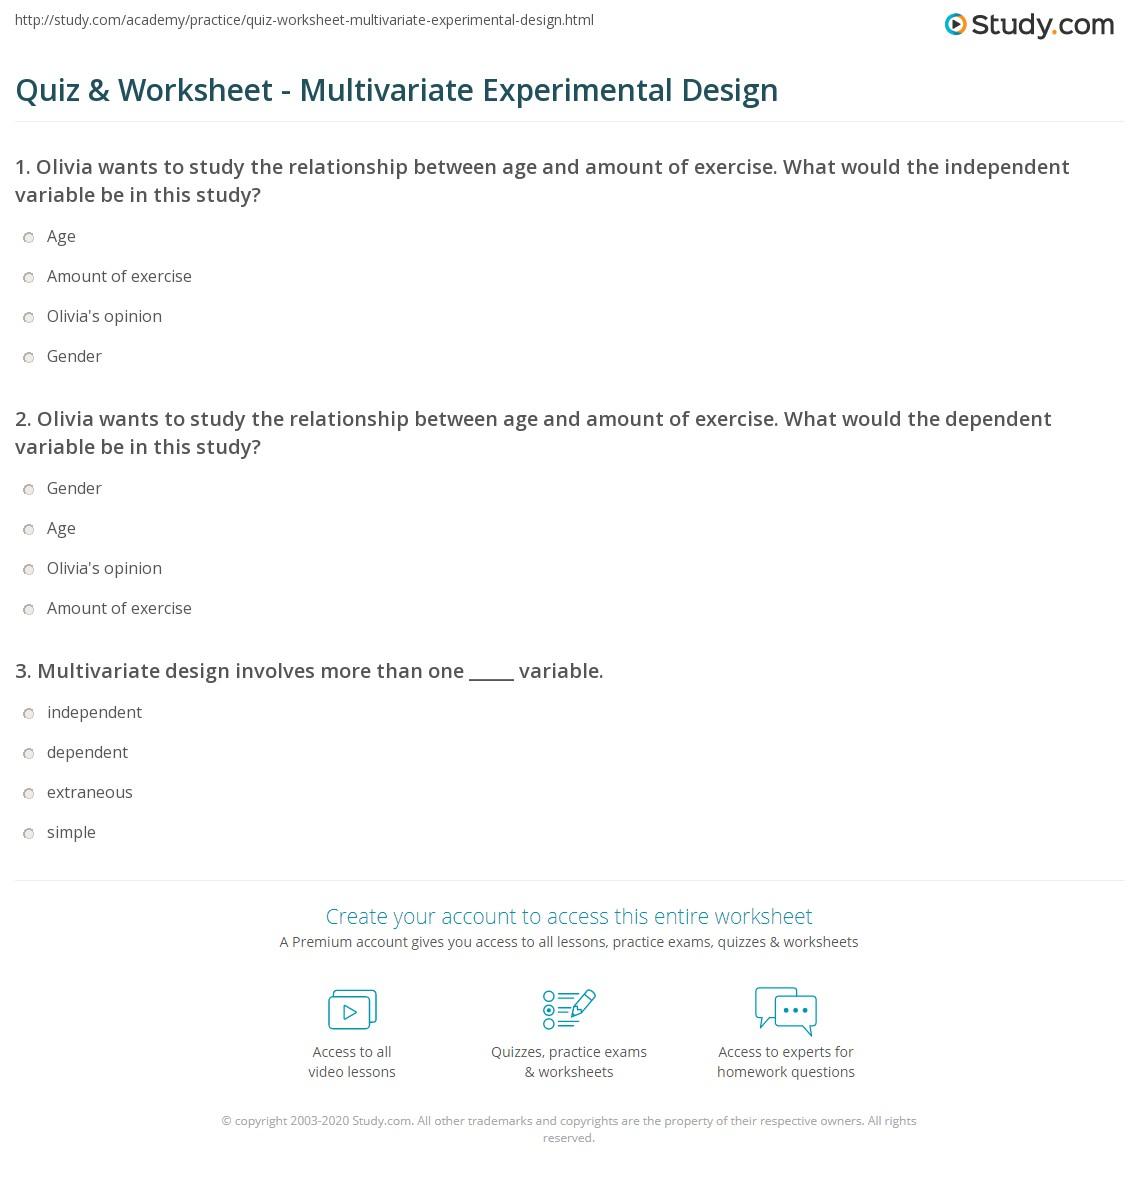 Science Experimental Design Worksheet: Multivariate Experimental Design